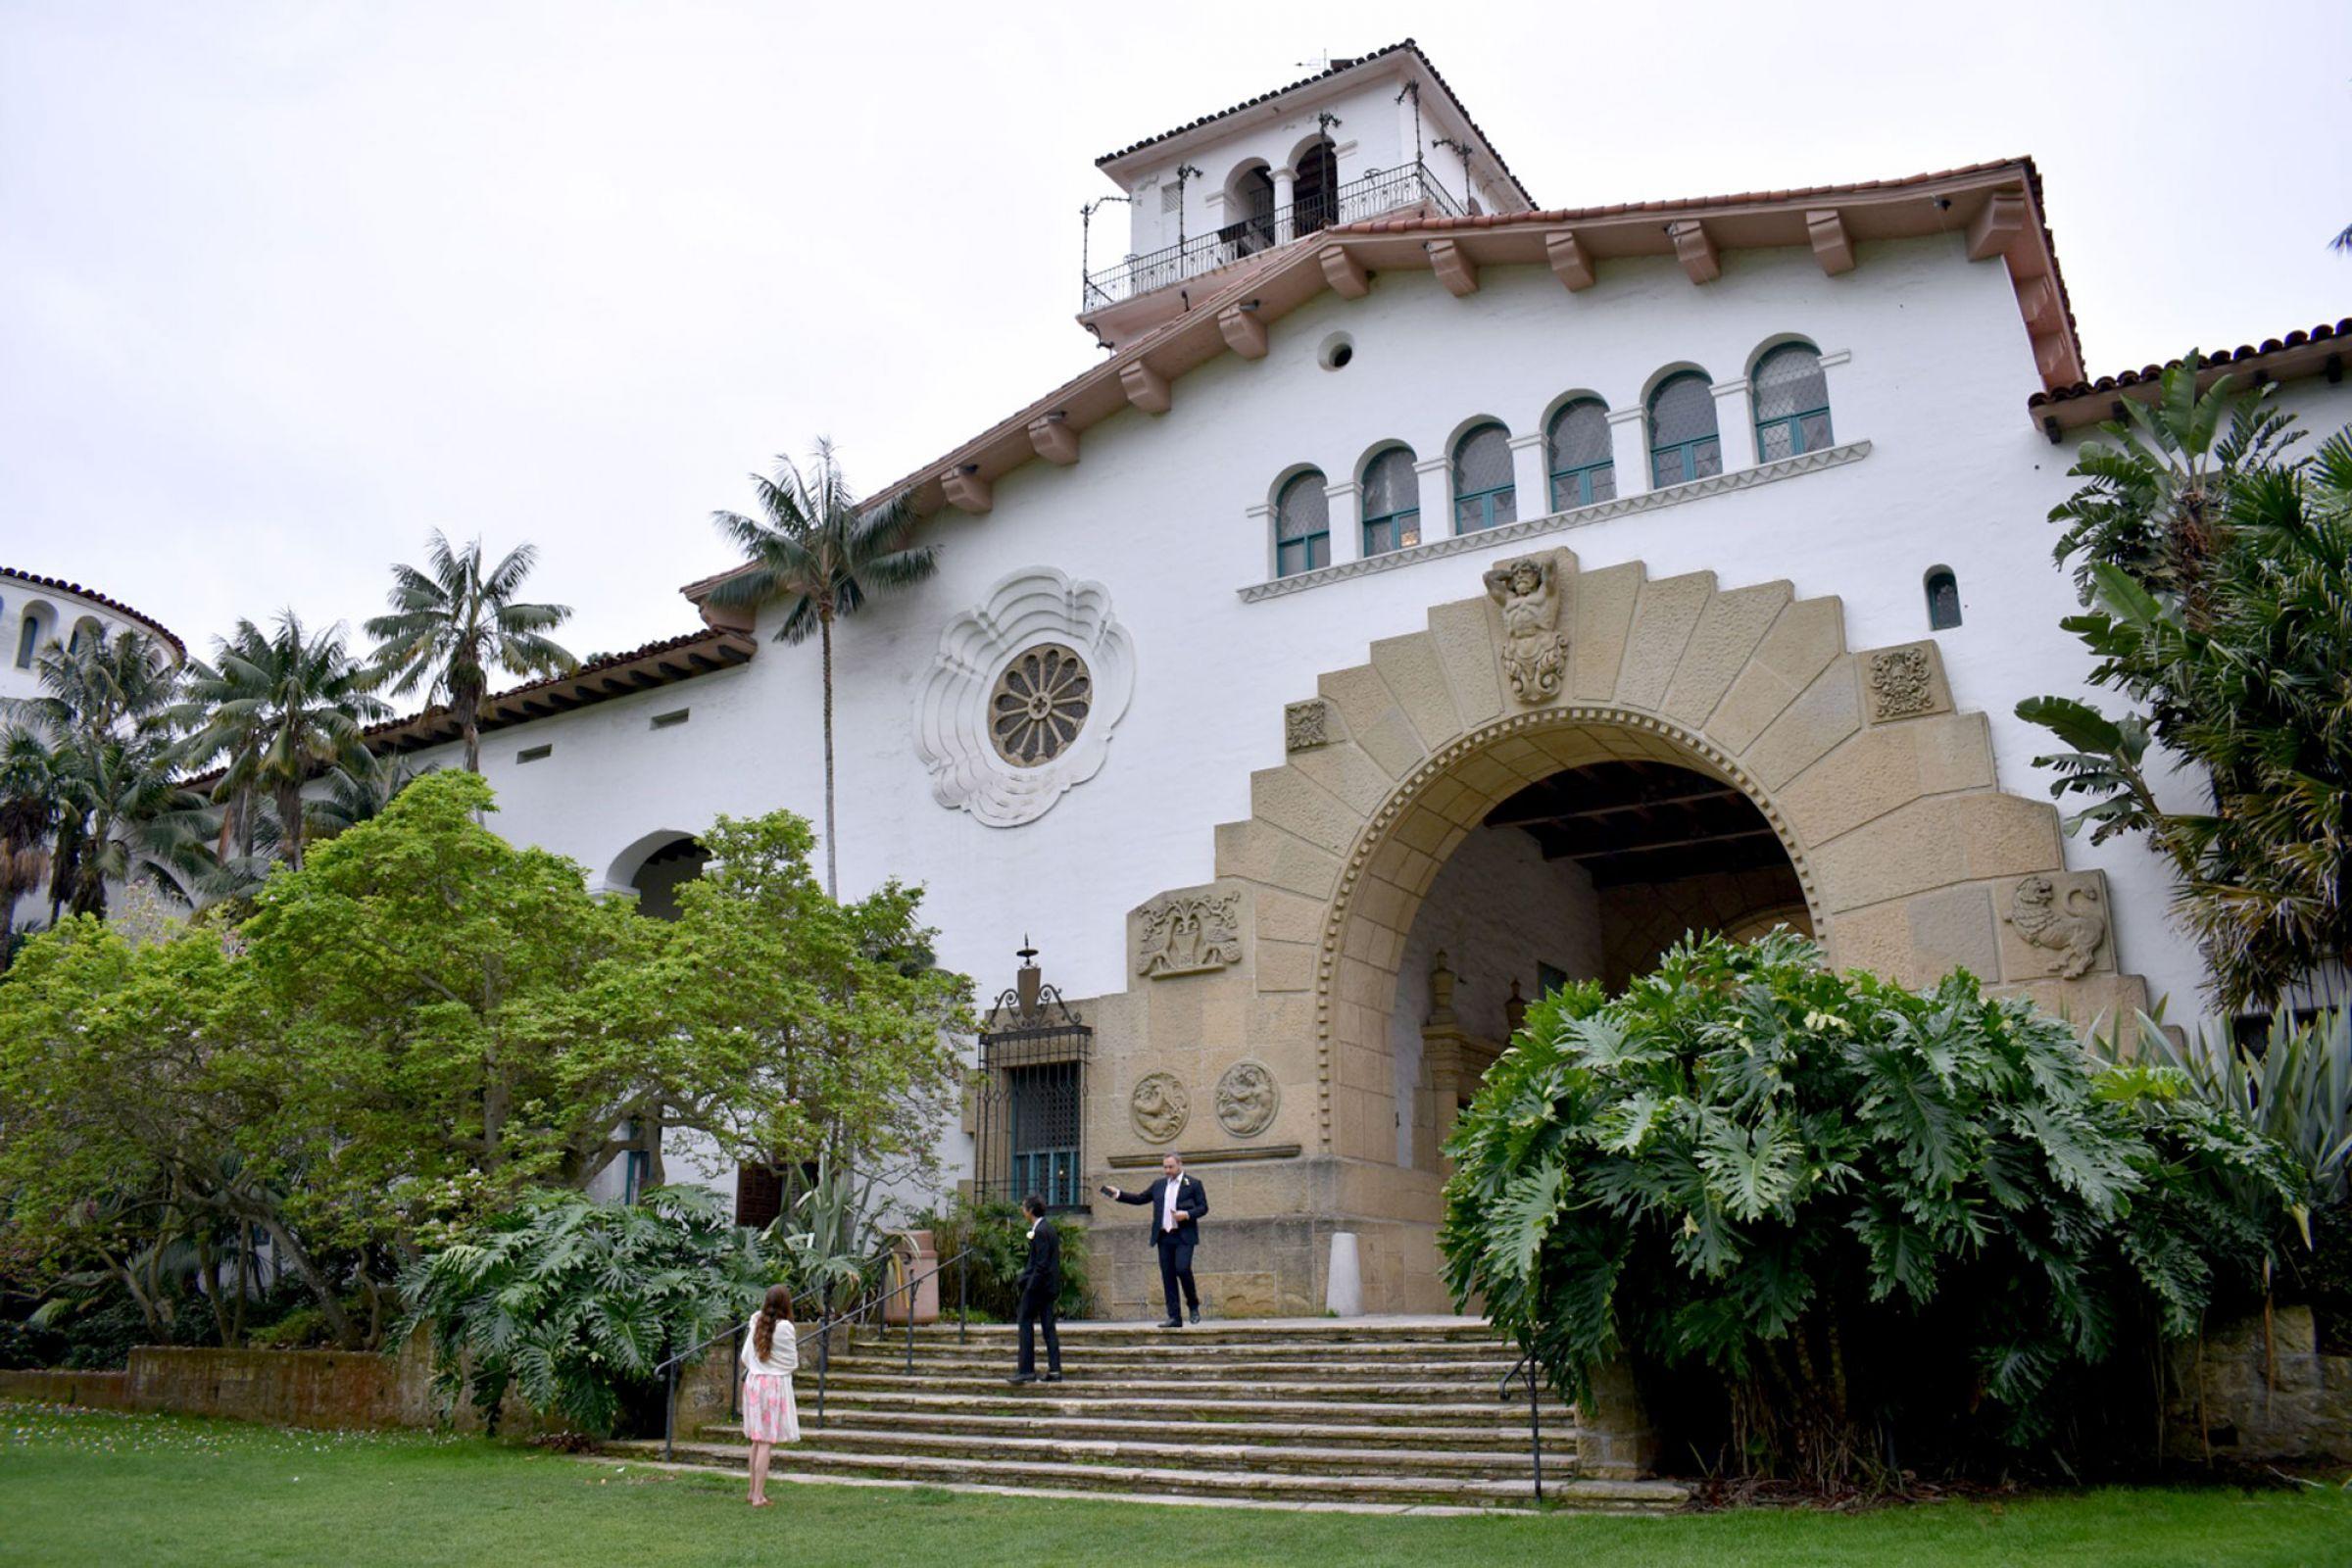 Coronavirus Response Likely To Curtail Operations In Santa Pertaining To Santa Barbara County Courthouse Calendar